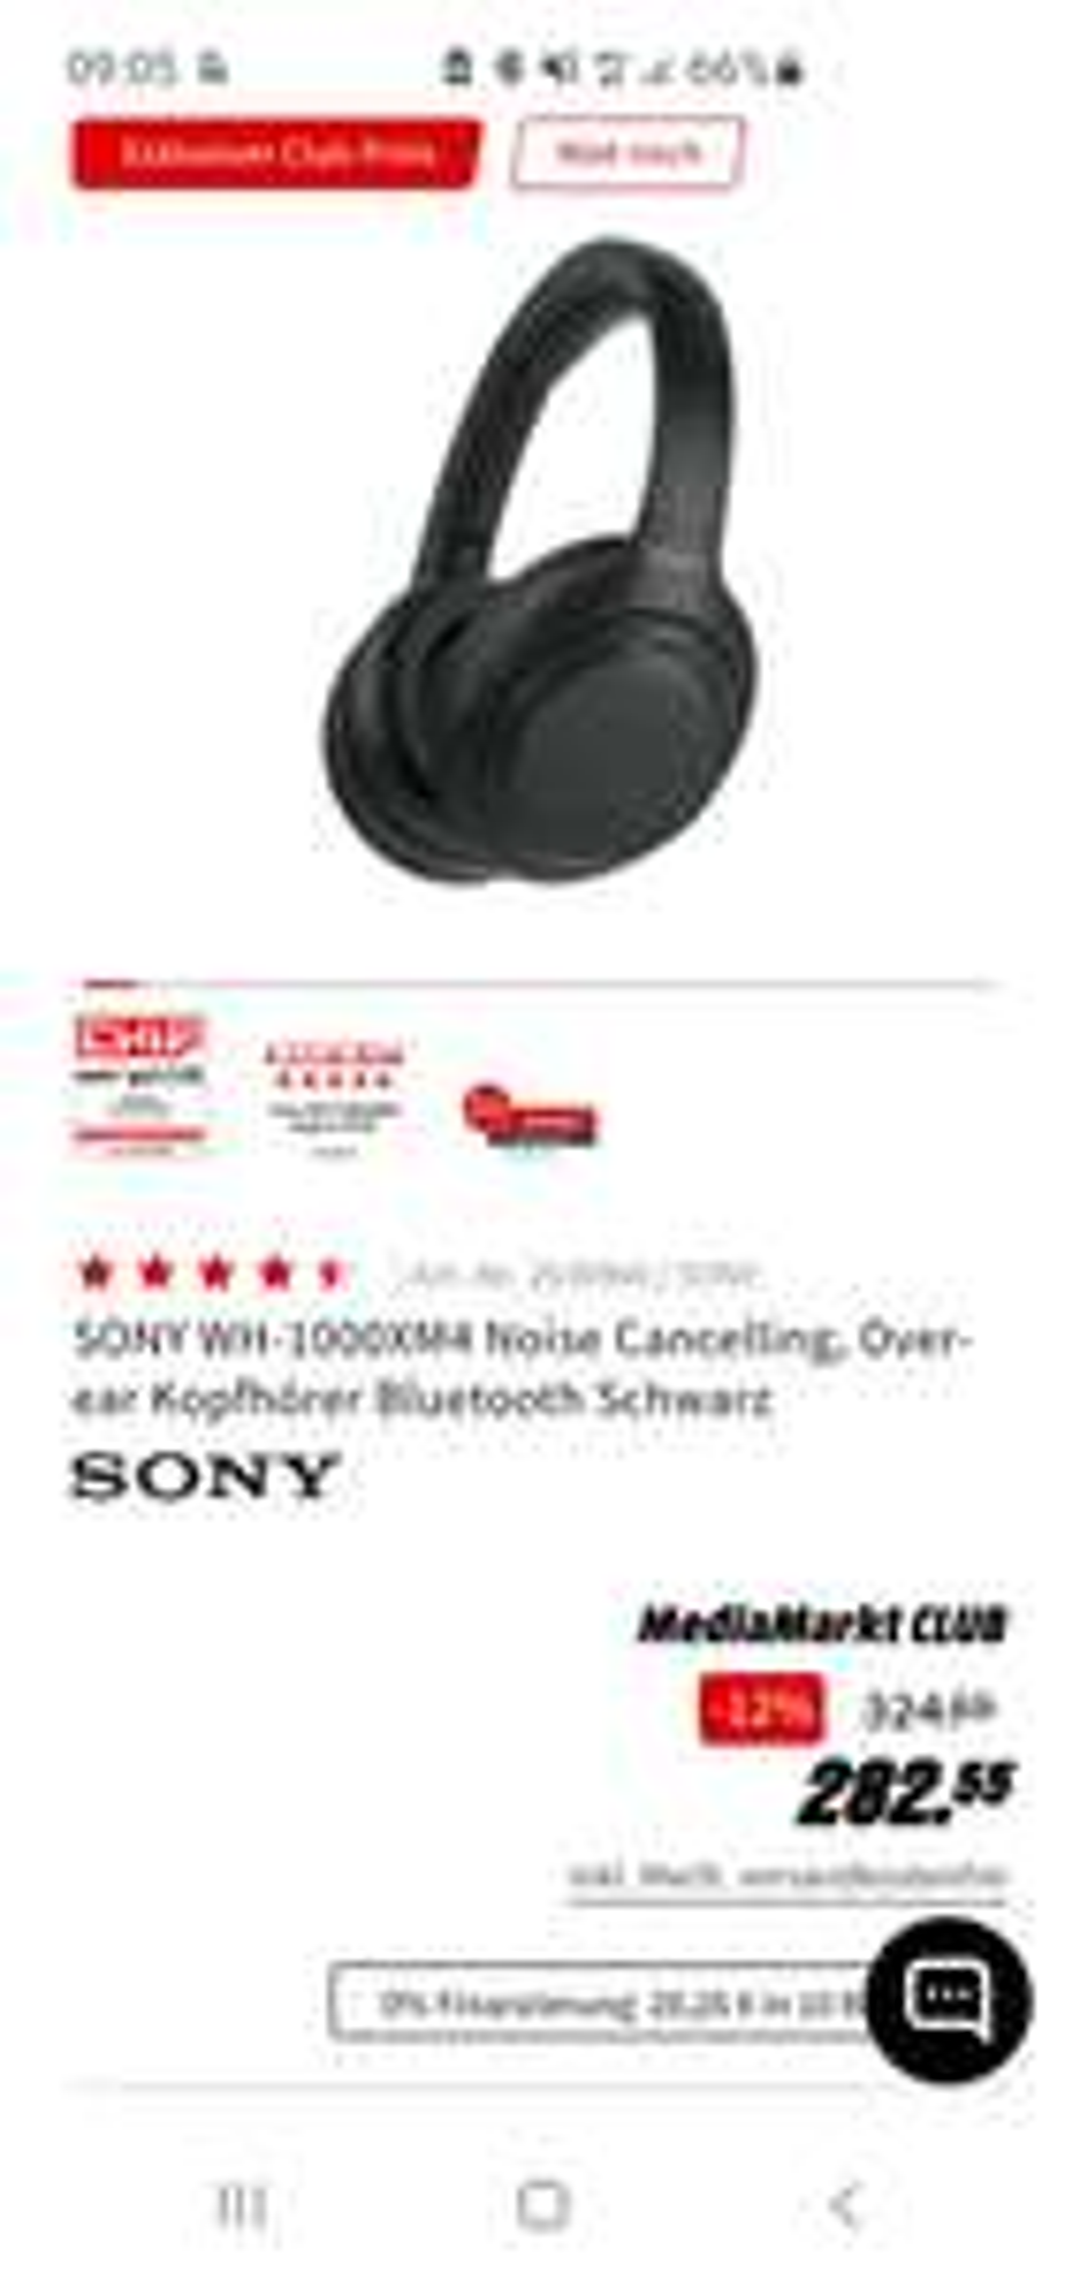 [MediaMarkt Club] SONY WH-1000XM4 Noise Cancelling, Over-ear Kopfhörer Bluetooth Schwarz